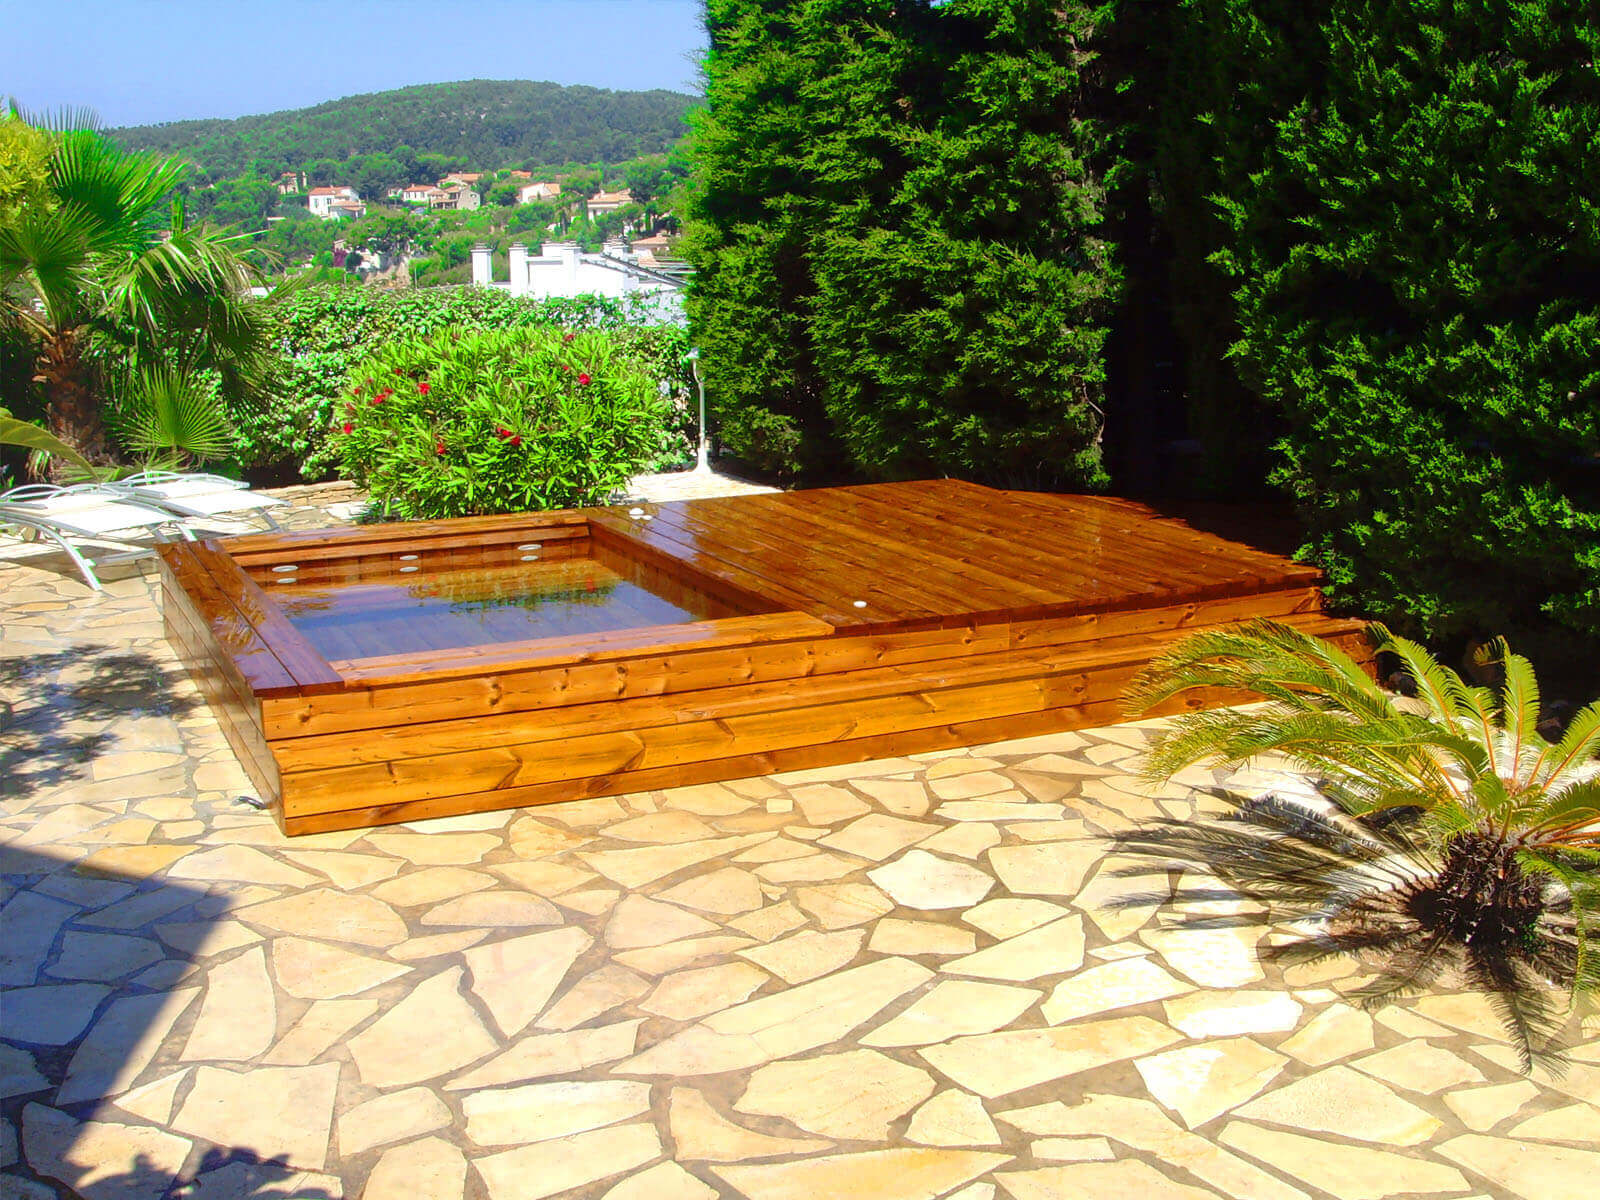 Fabricant piscine et jacuzzi spa sur mesure 100 bois for Prix piscine terrasse